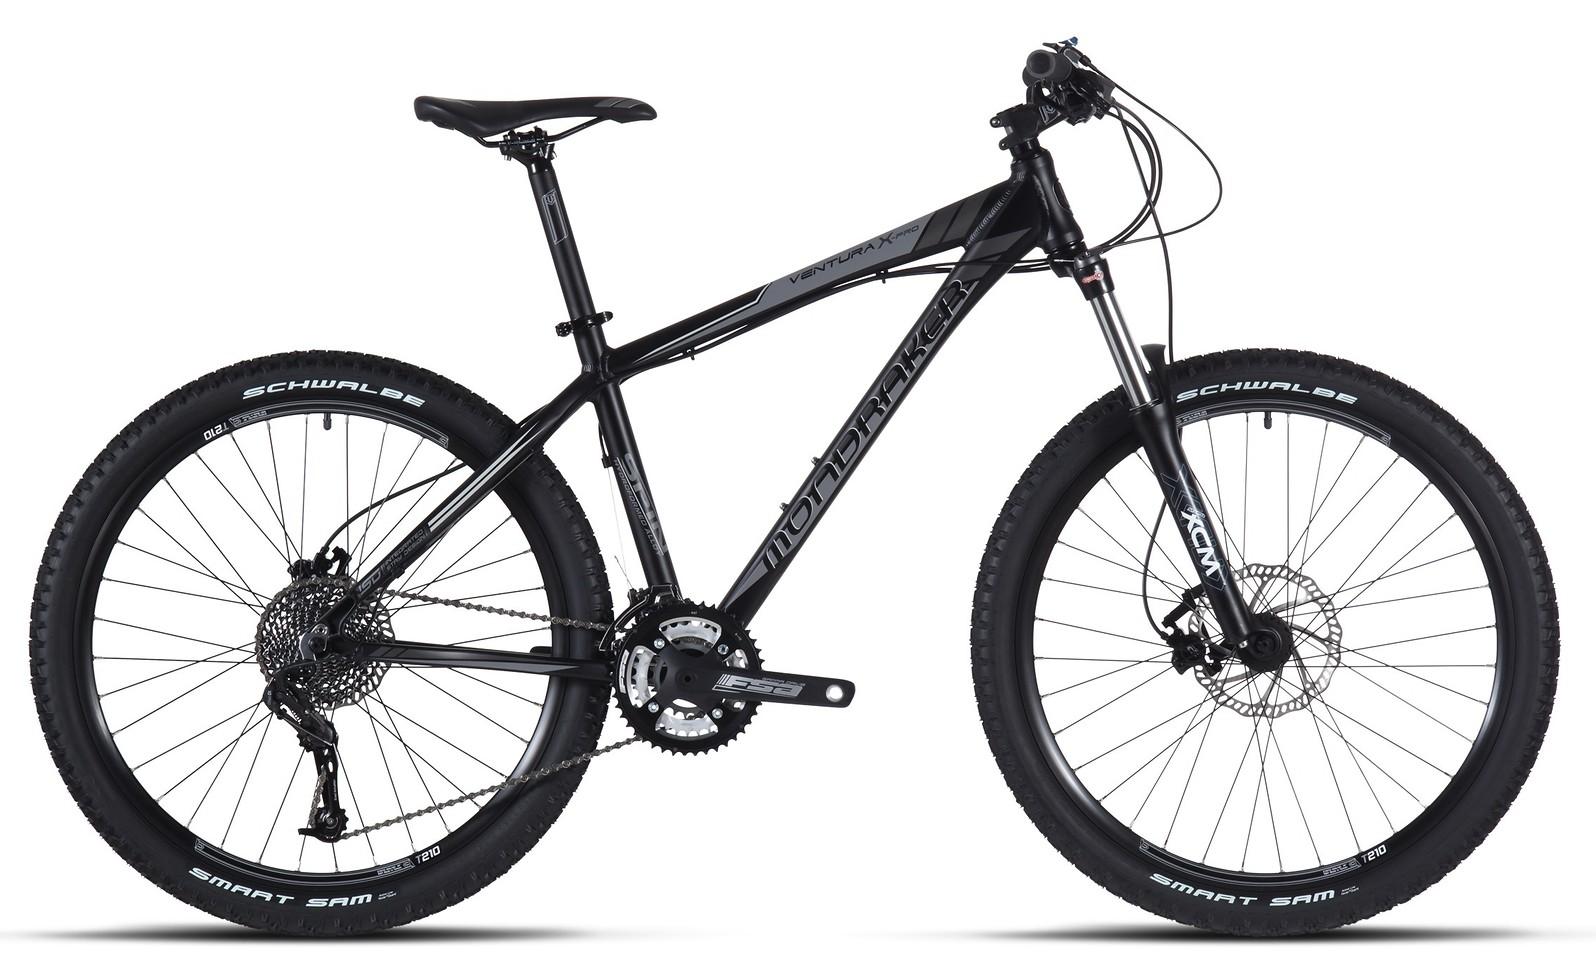 2013 Mondraker Ventura X Pro Bike bike - mondraker ventura x-pro